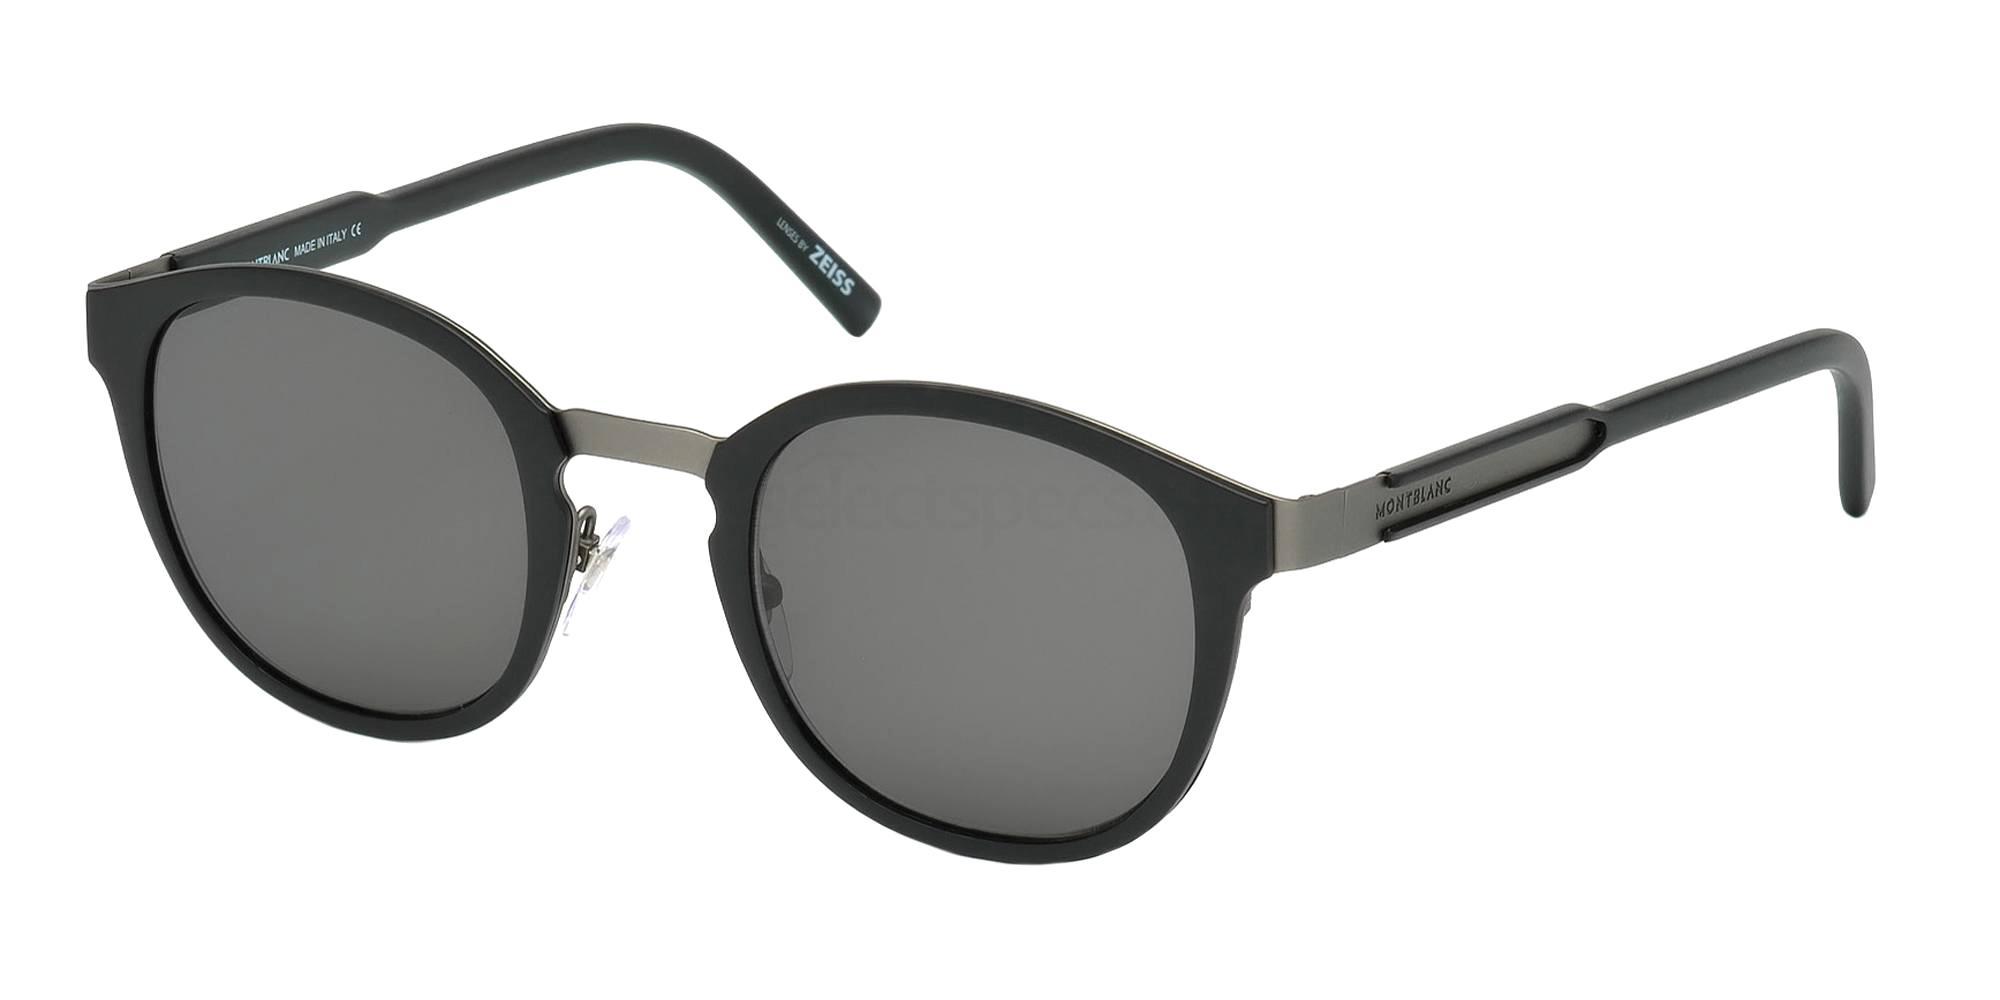 02A MB590S Sunglasses, Mont Blanc